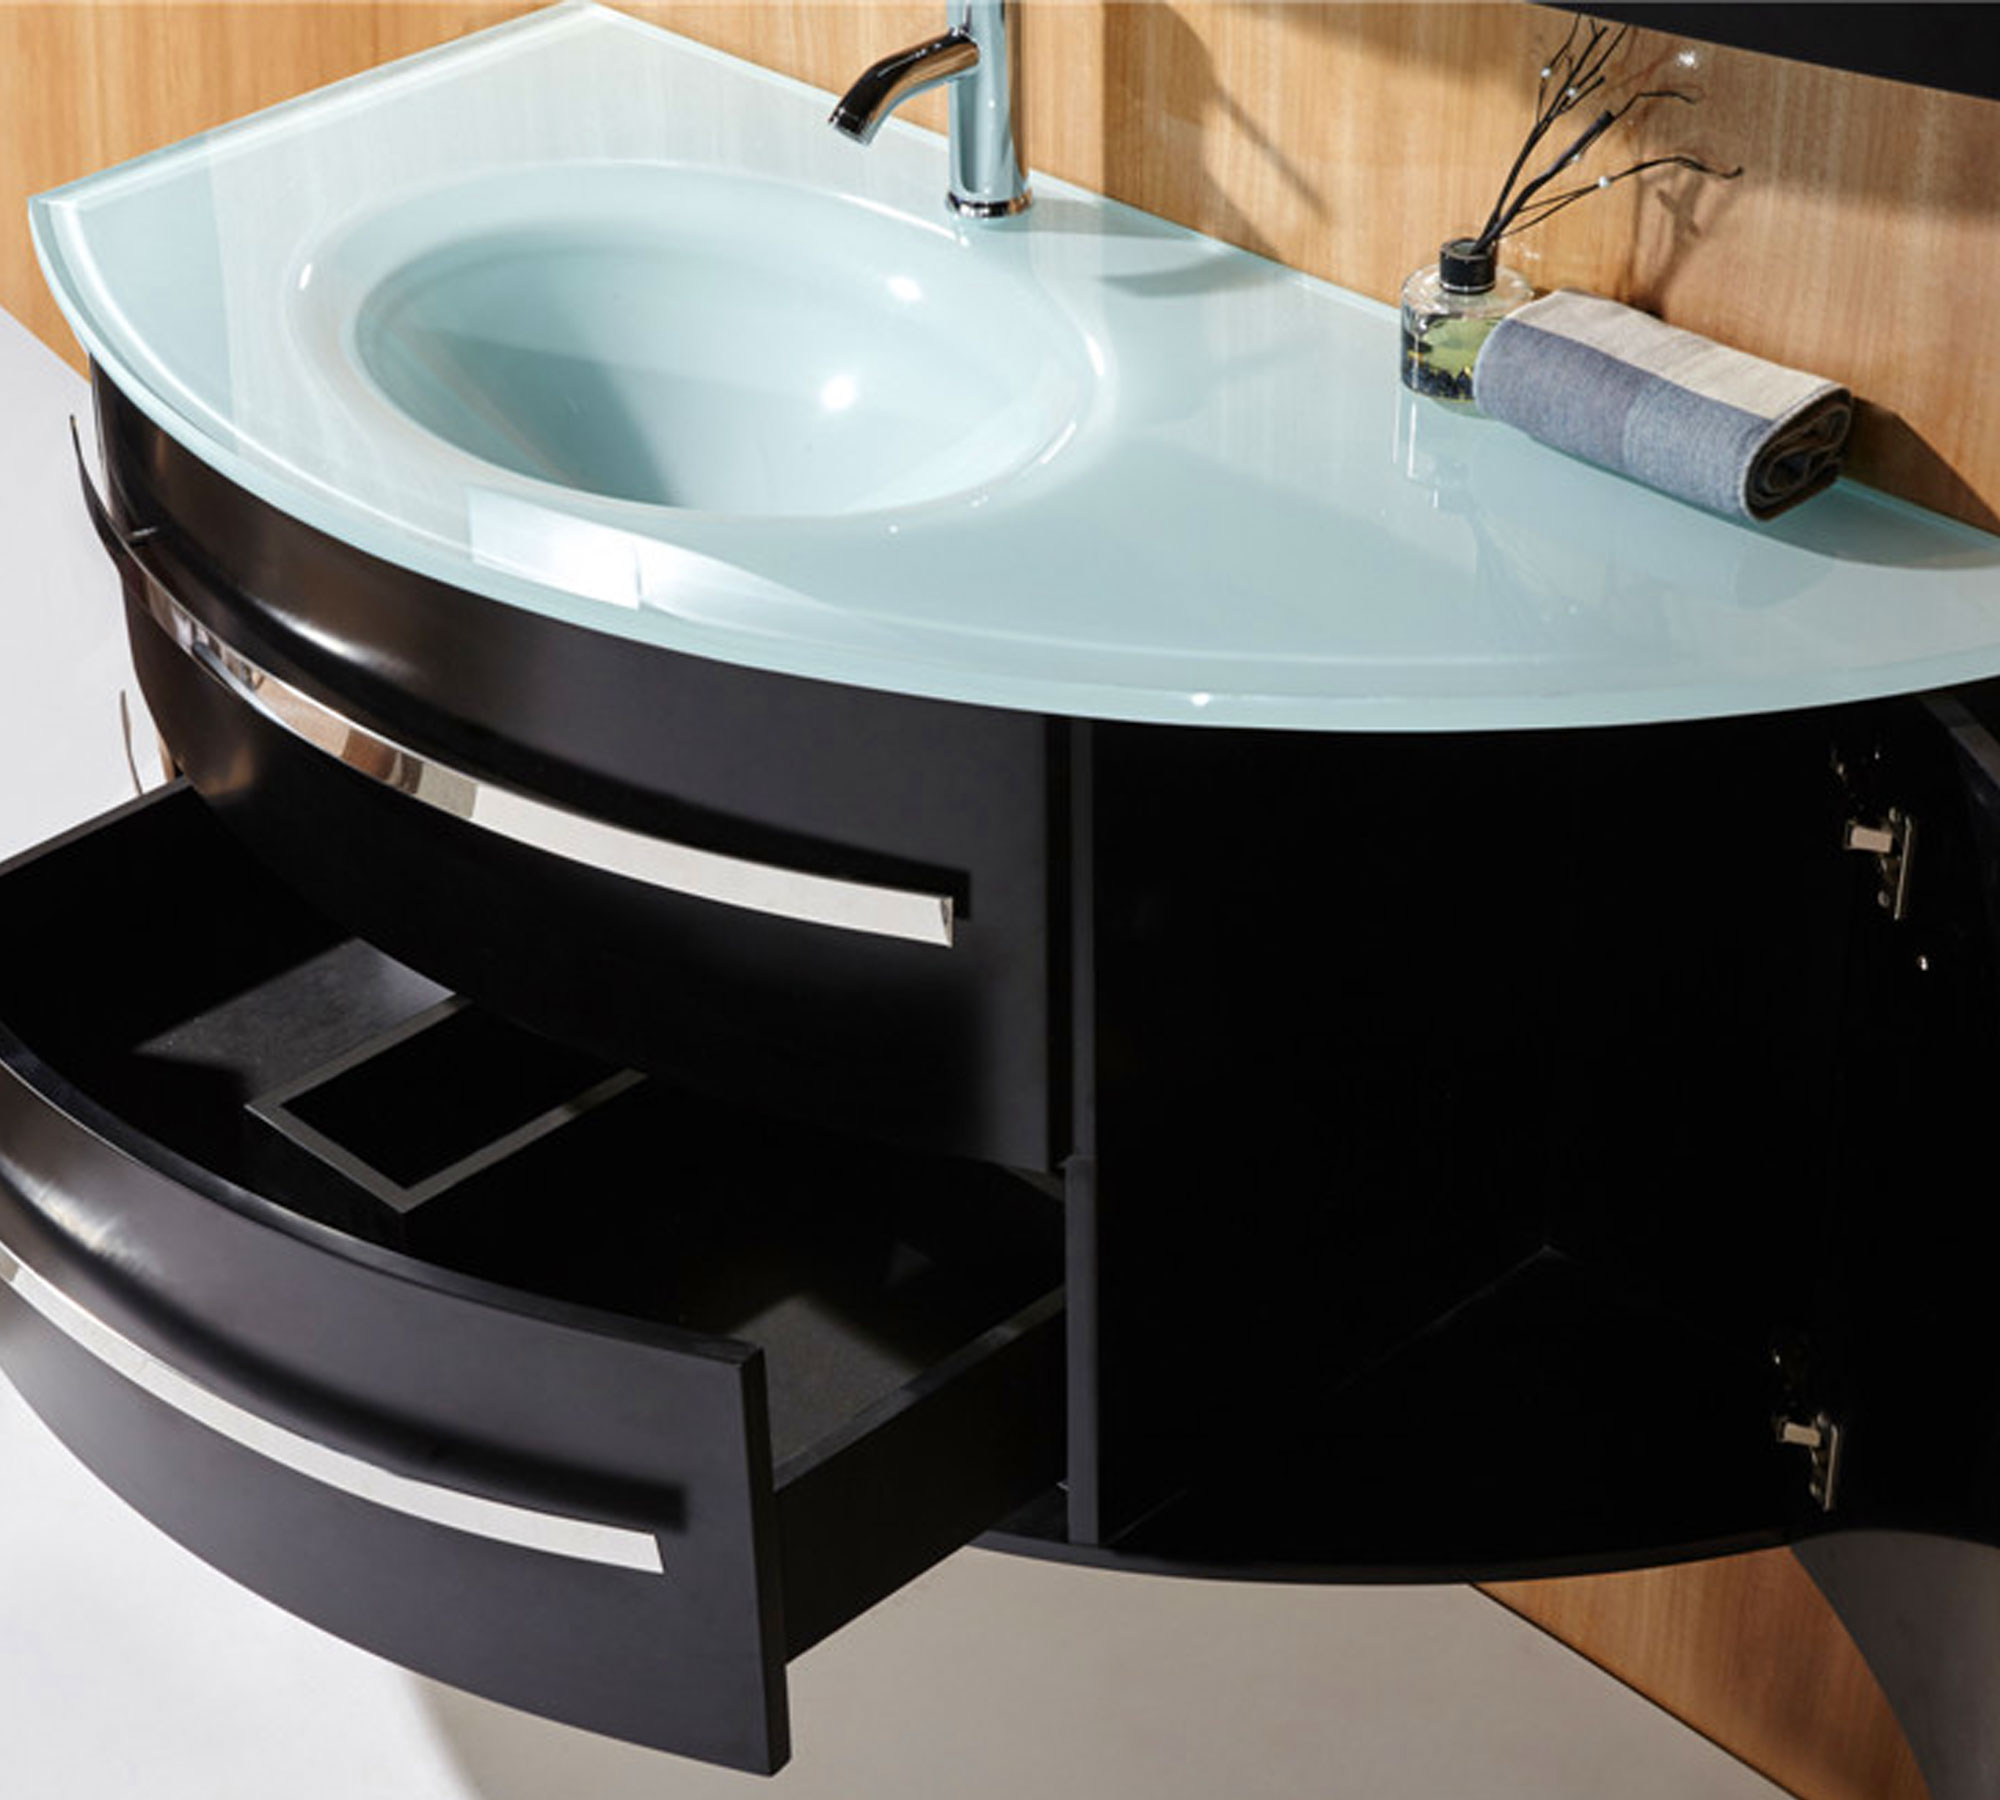 black ambassador mobile bagno arredo bagno 120 cm colonna e lavabo inclusi. Black Bedroom Furniture Sets. Home Design Ideas